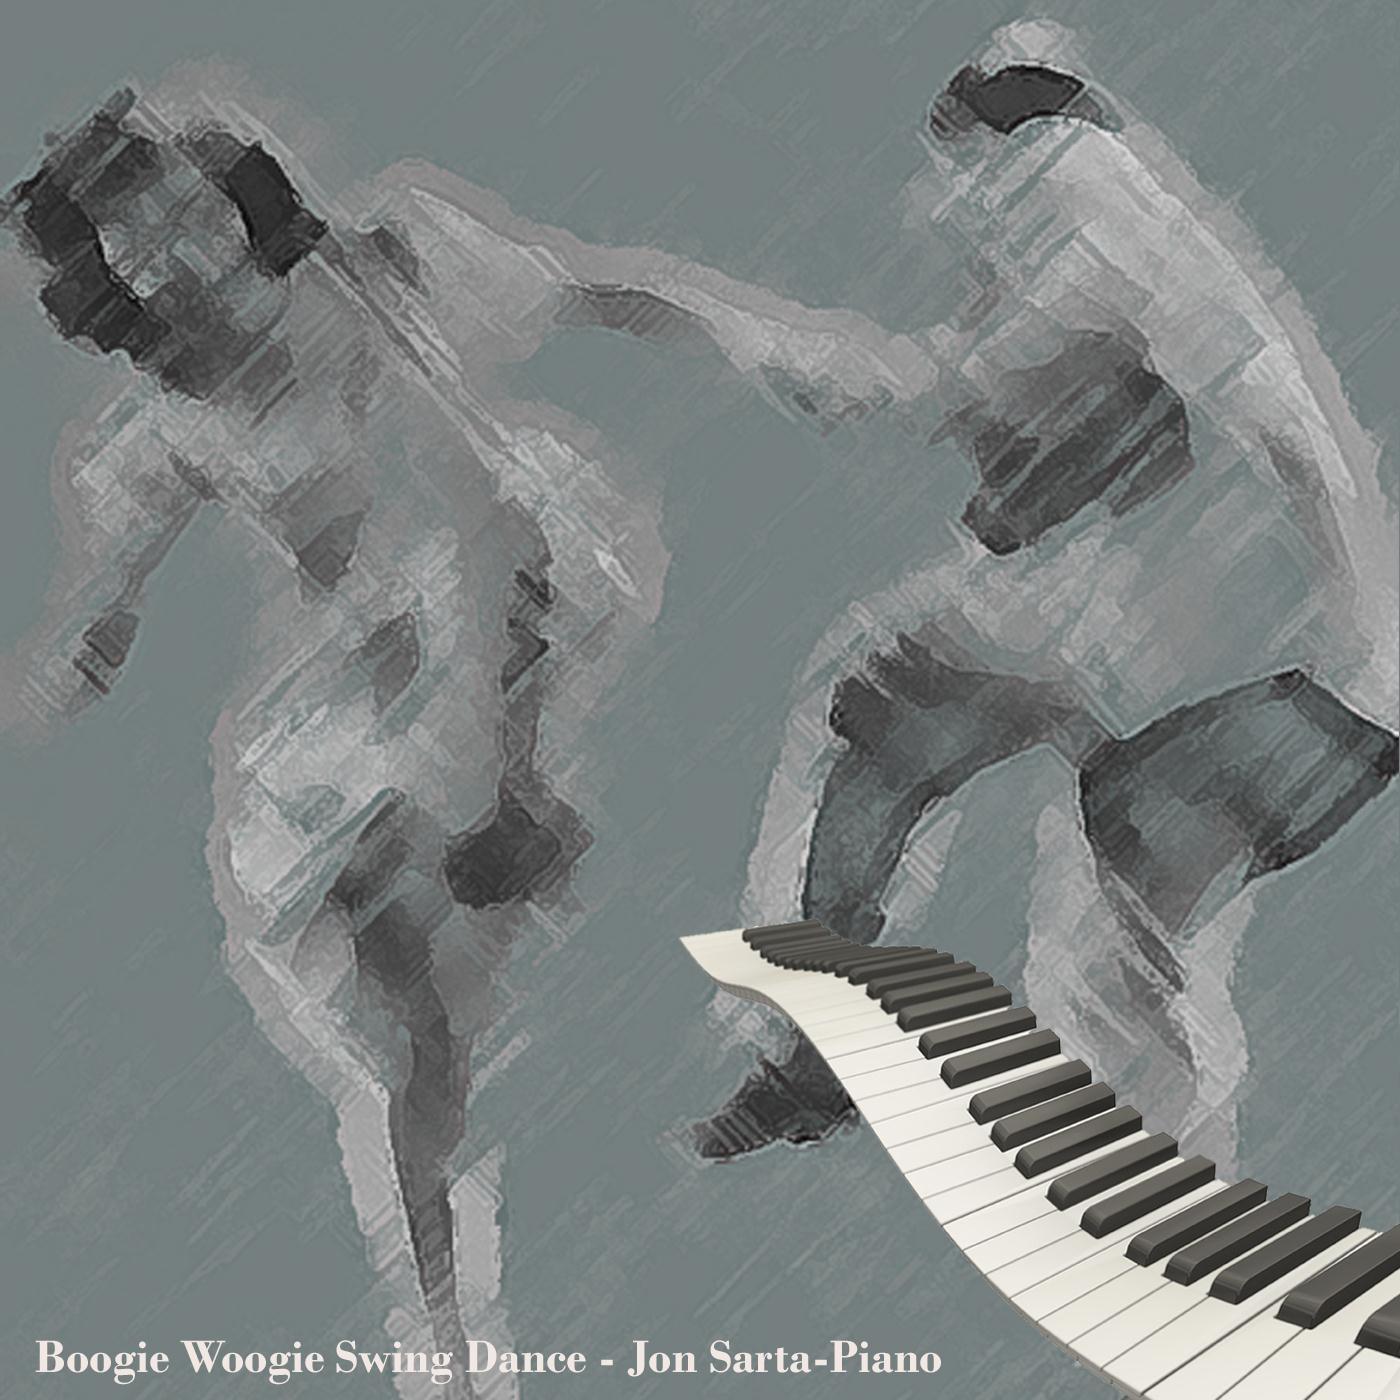 Boogie Woogie Swing Dance